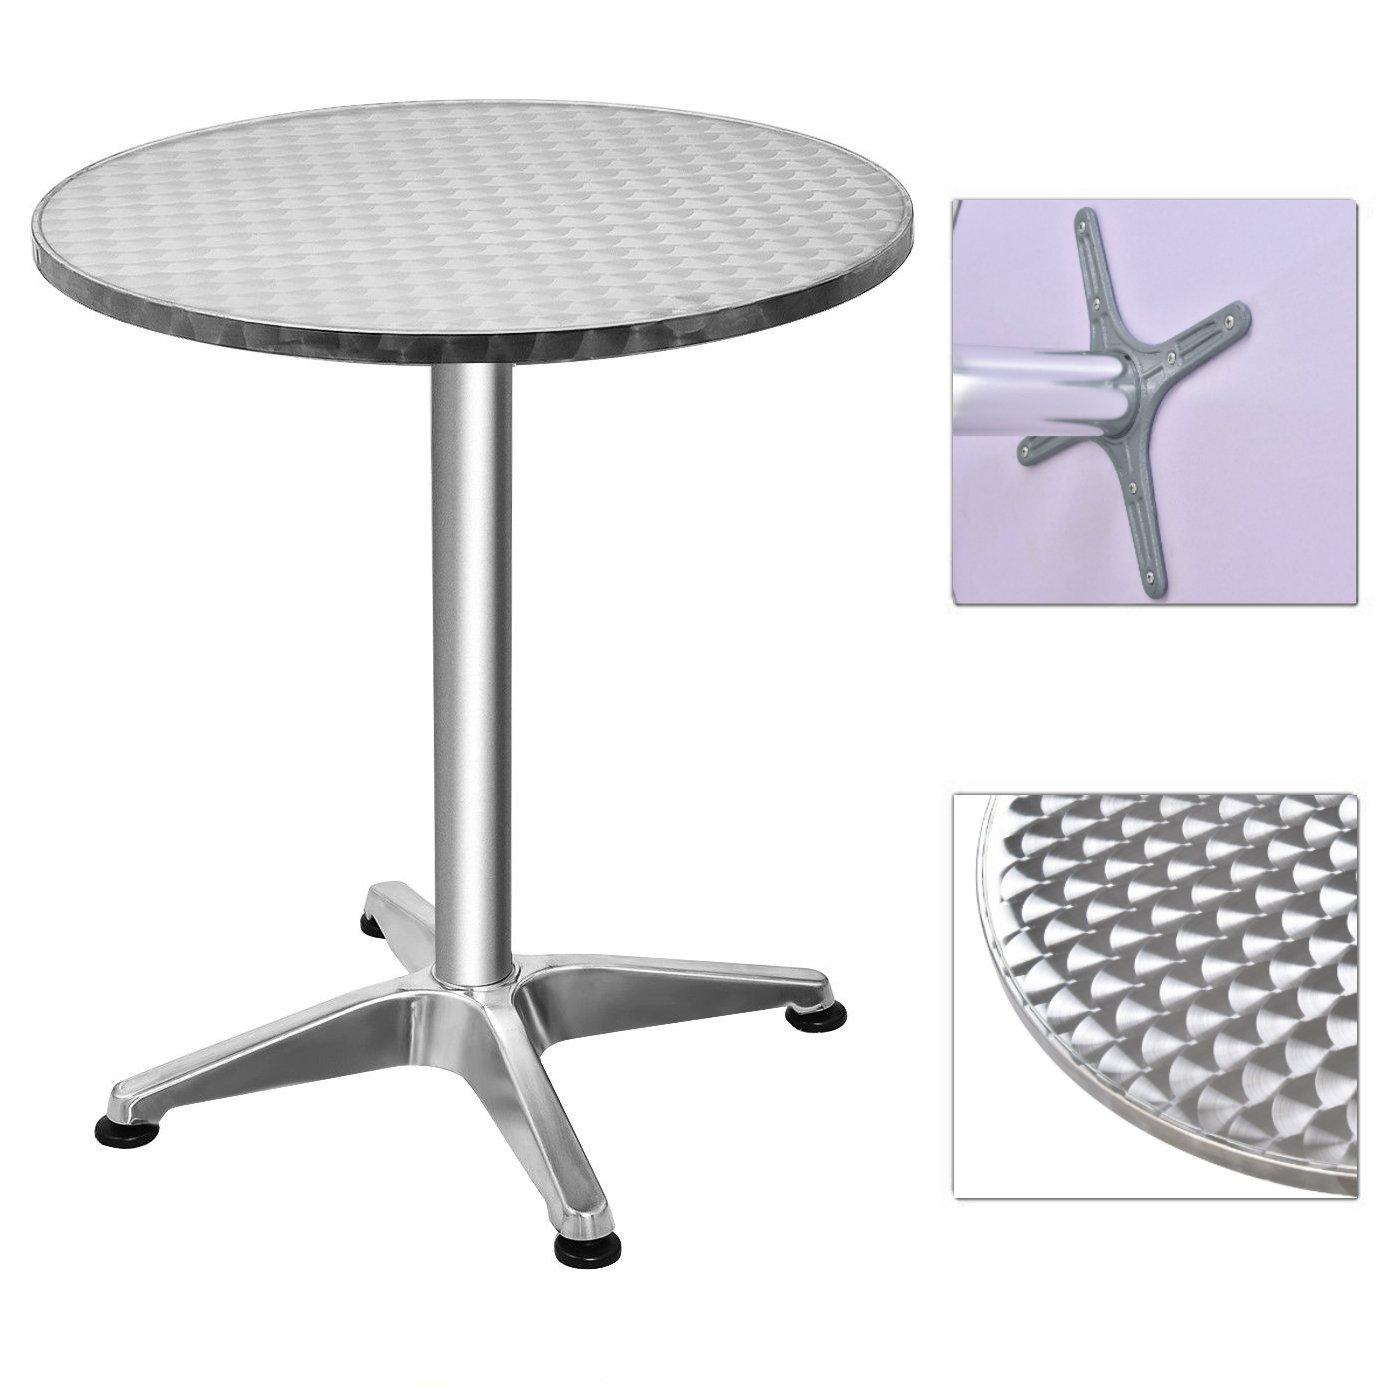 Durable Aluminium Round Top Bar Table Bistro Pub Cocktail Pedestal Table